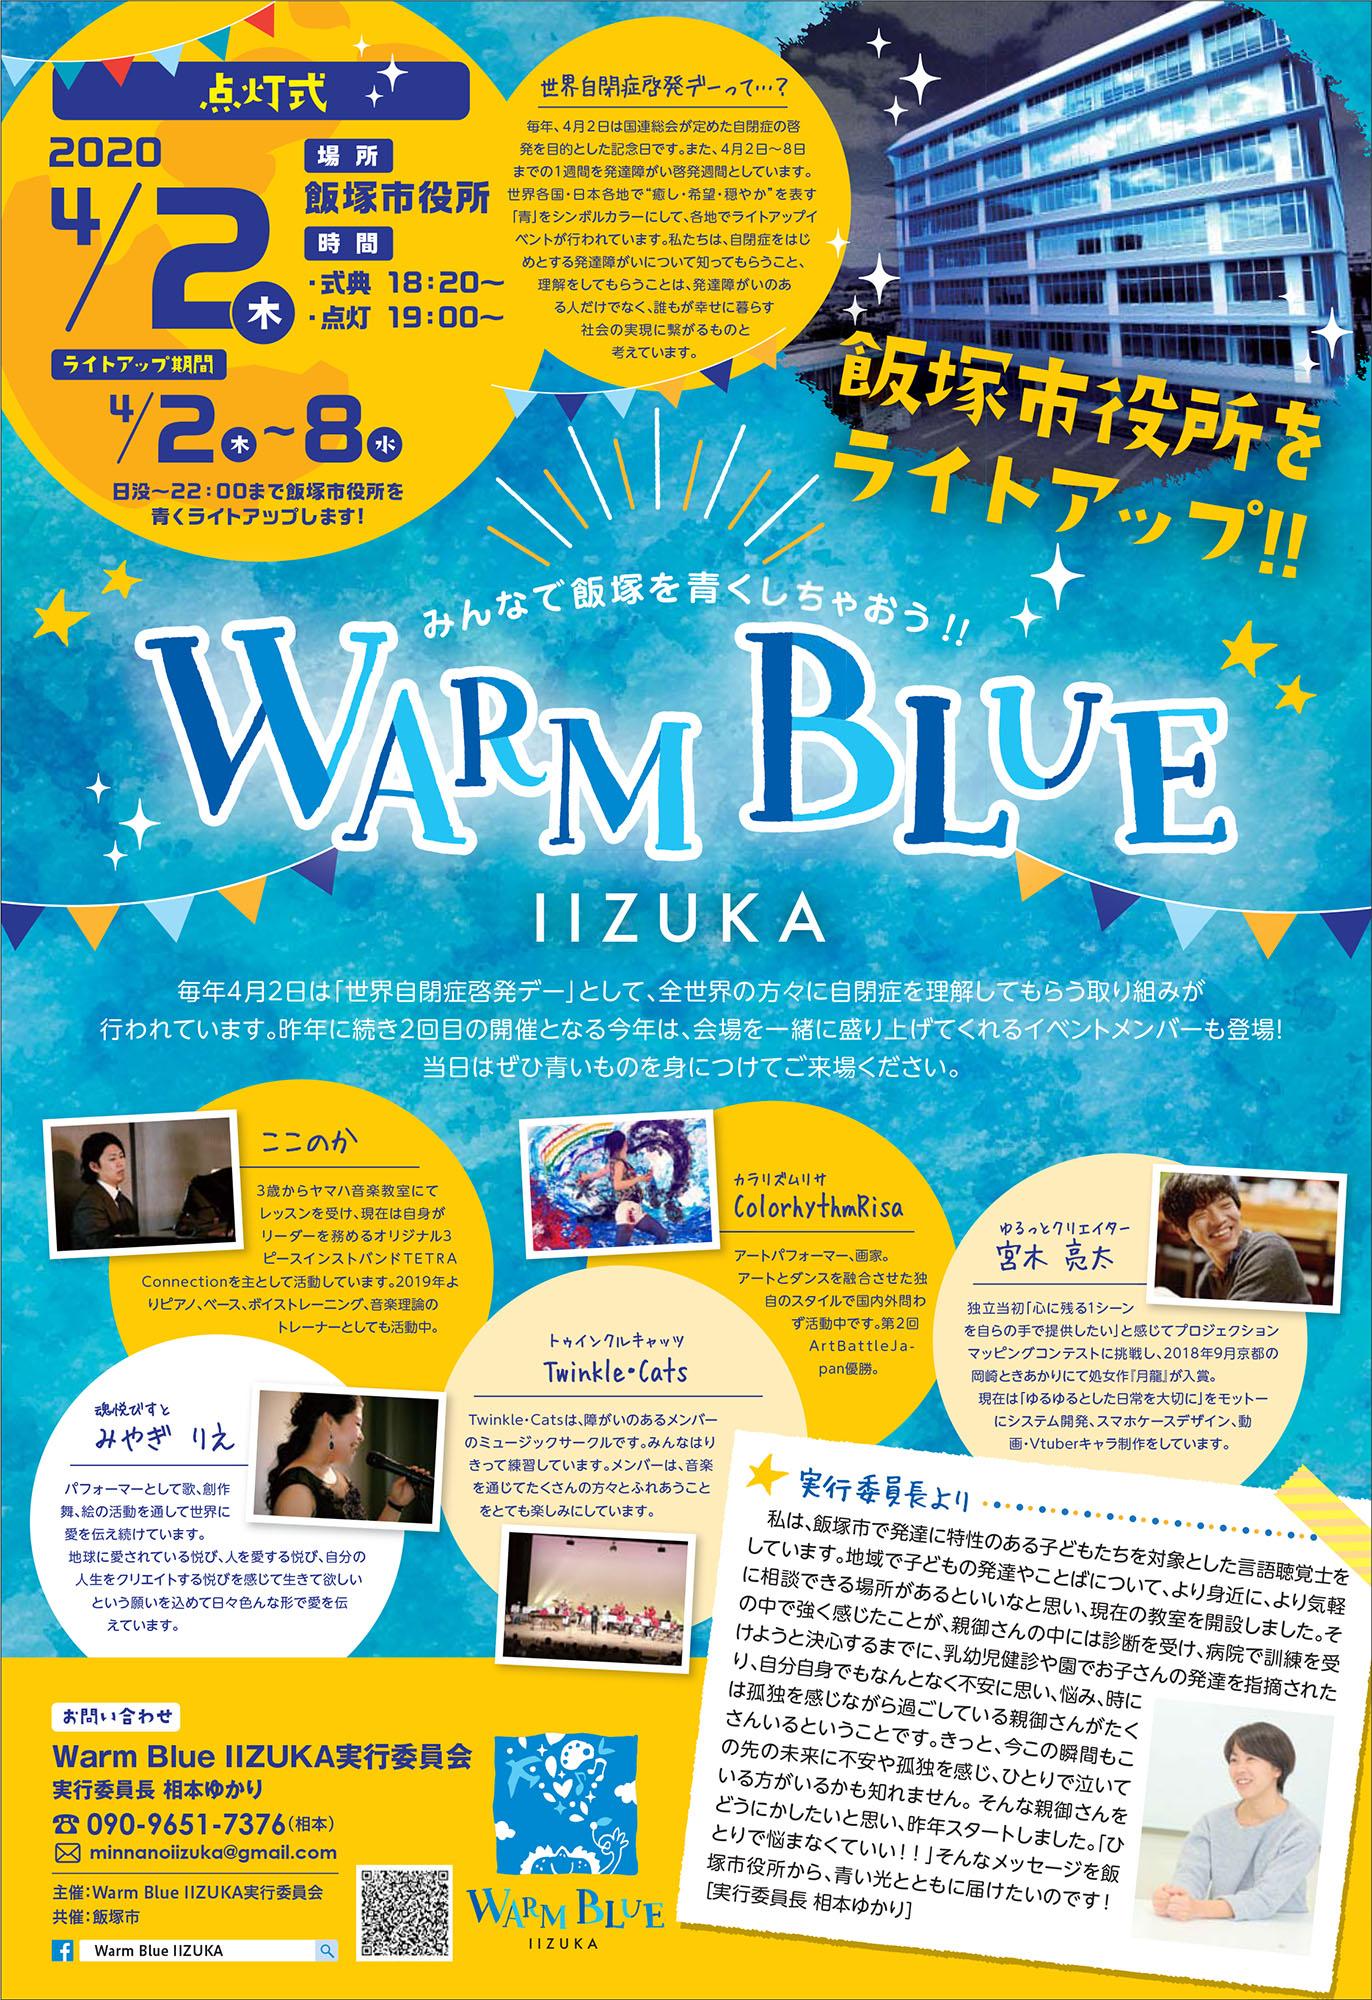 WARM BLUE IIZUKA 2020